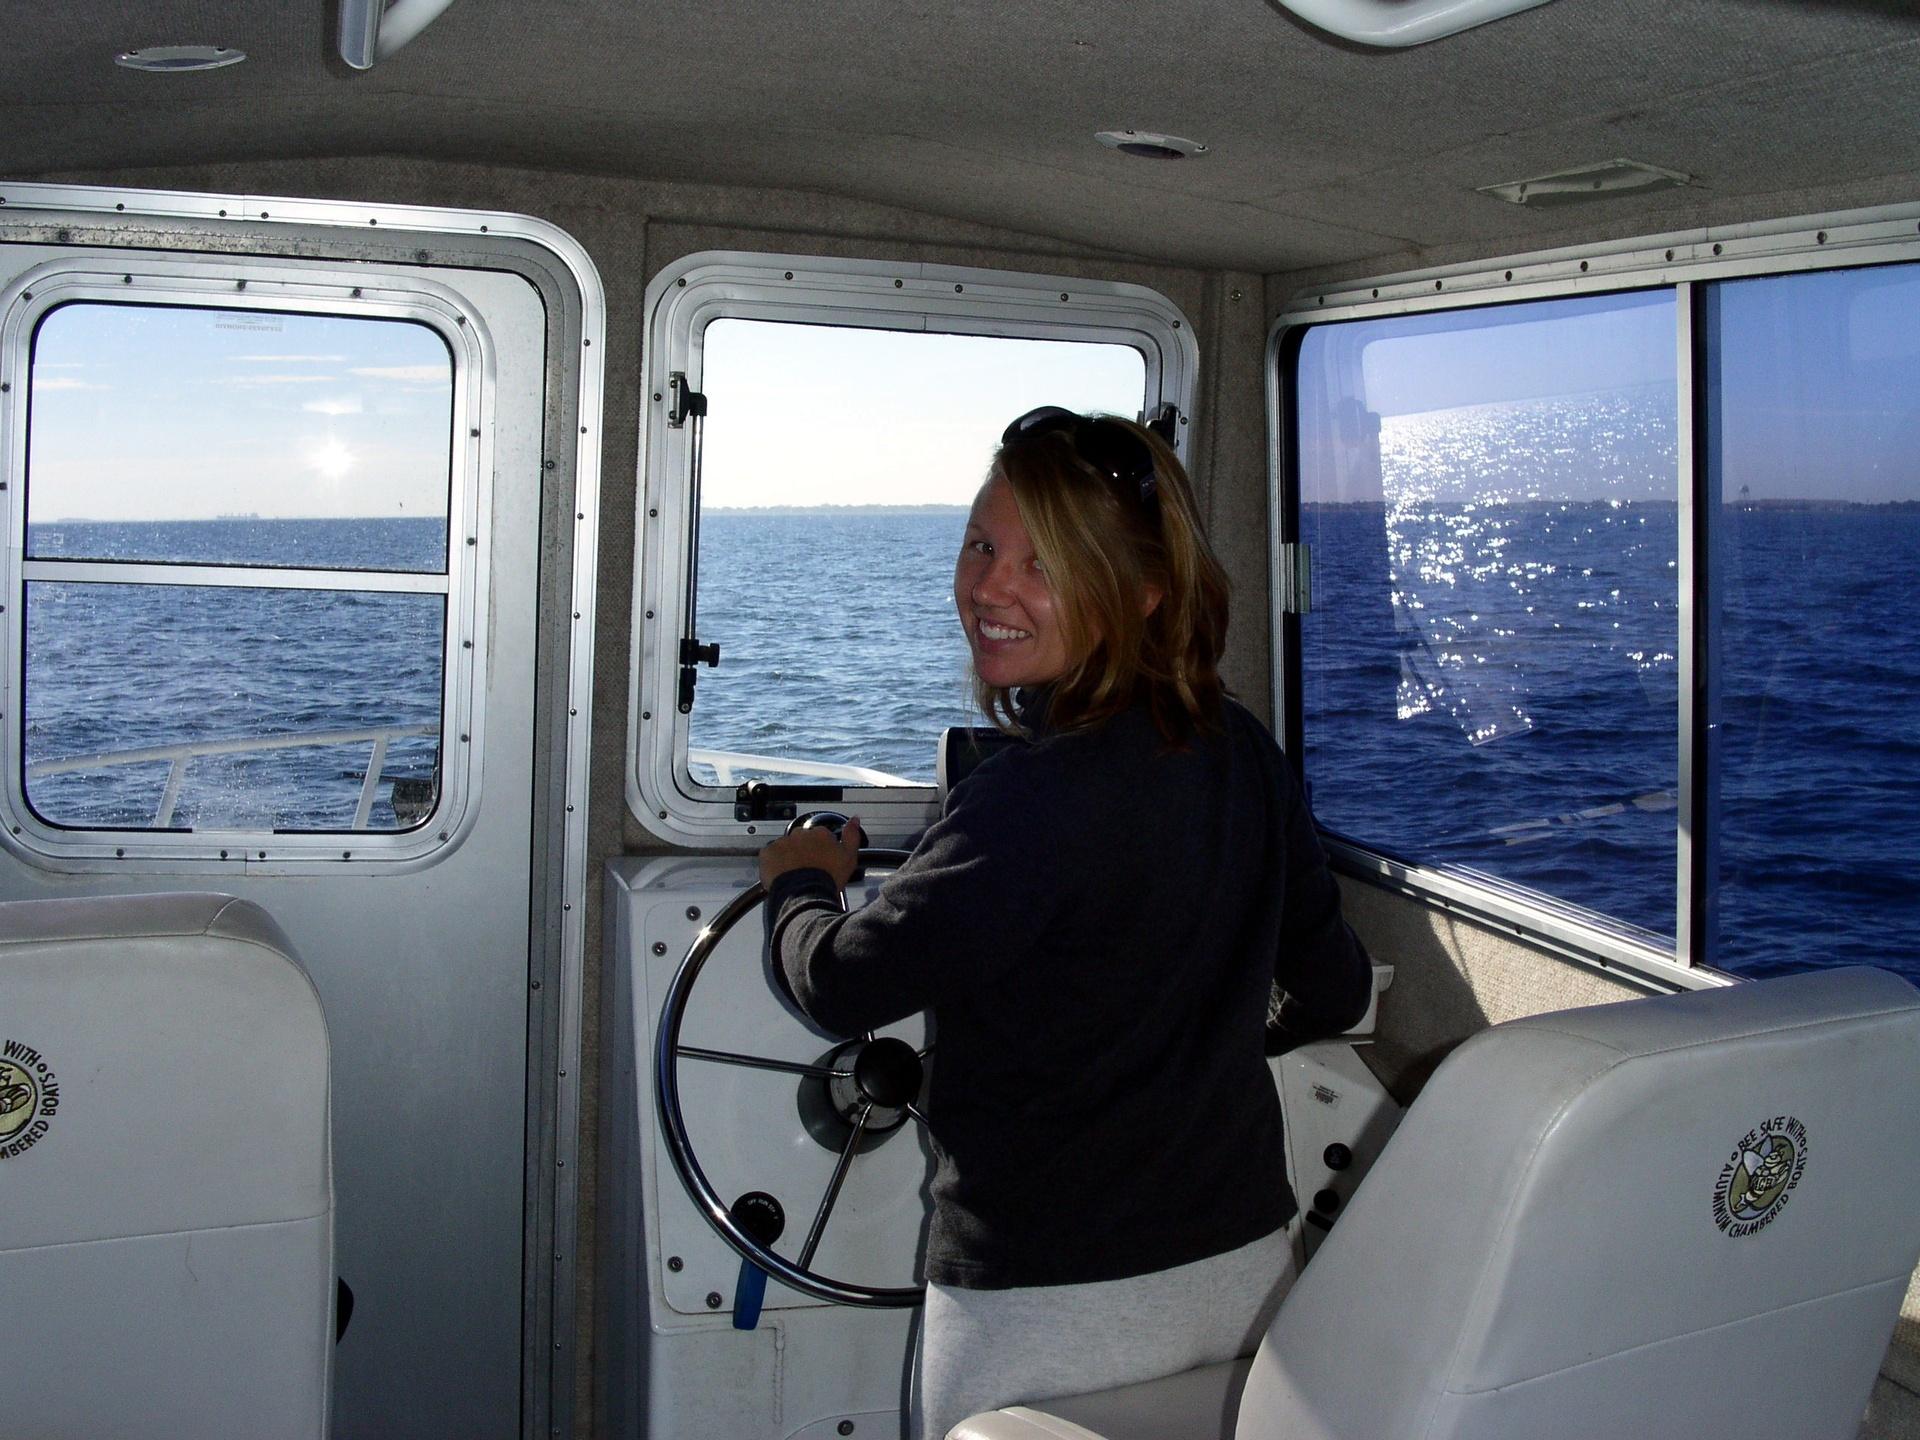 Surface water monitoring in Tampa Bay, Florida